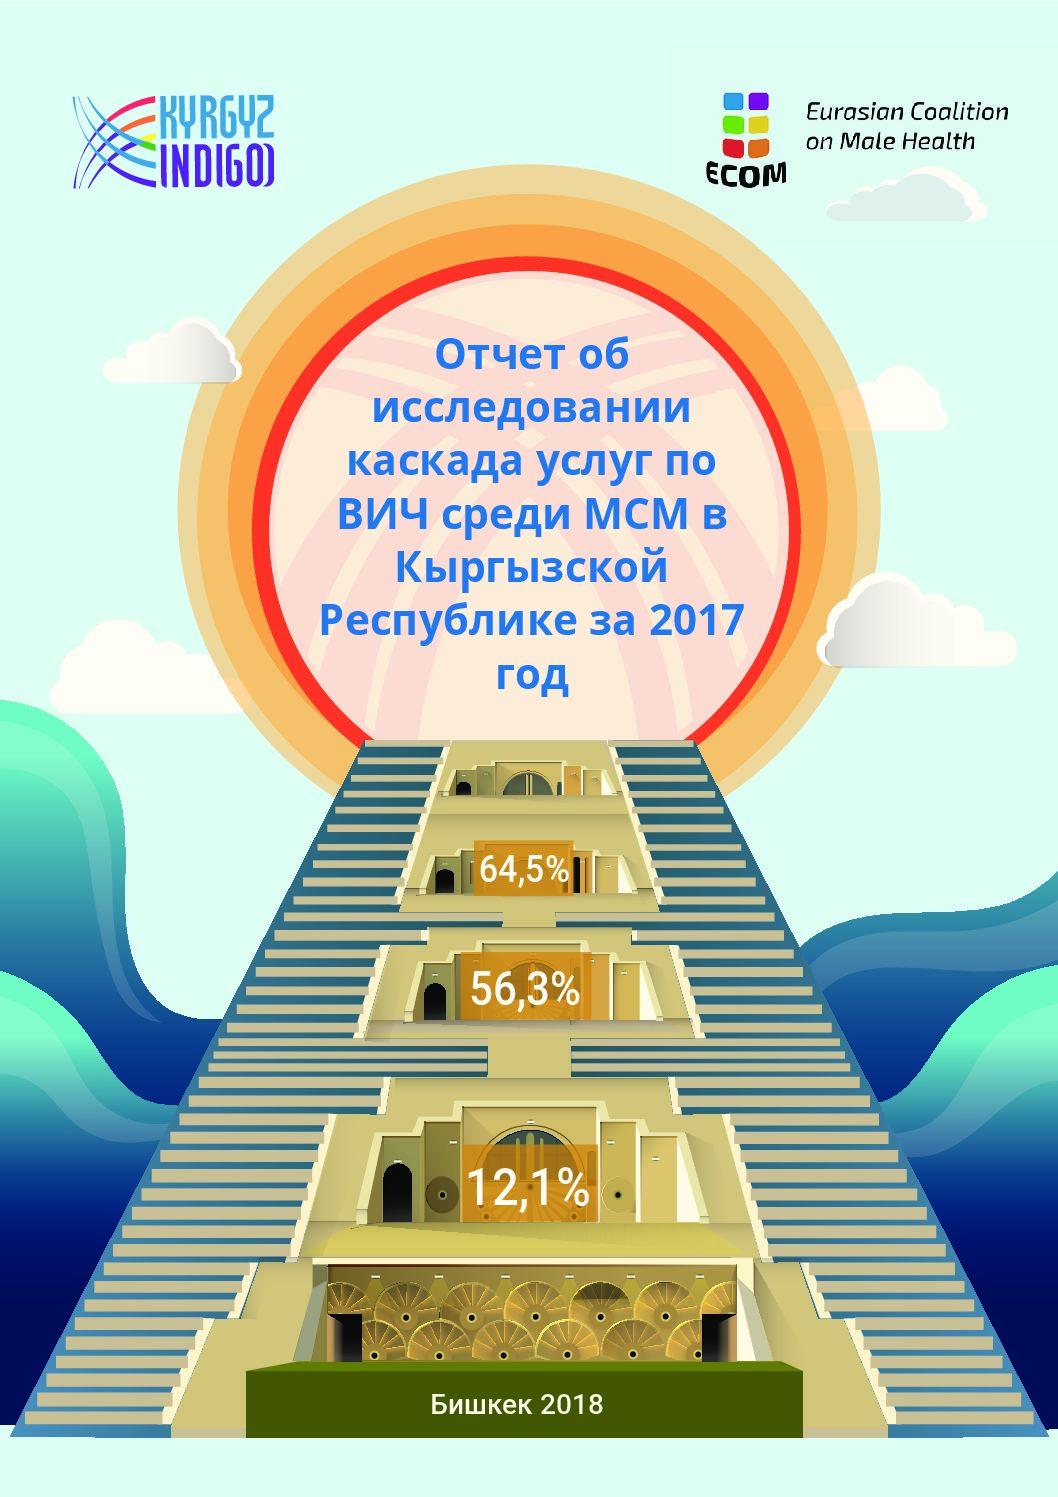 Отчет об исследовании каскада услуг по ВИЧ среди МСМ в Кыргызской Республике за 2017 год